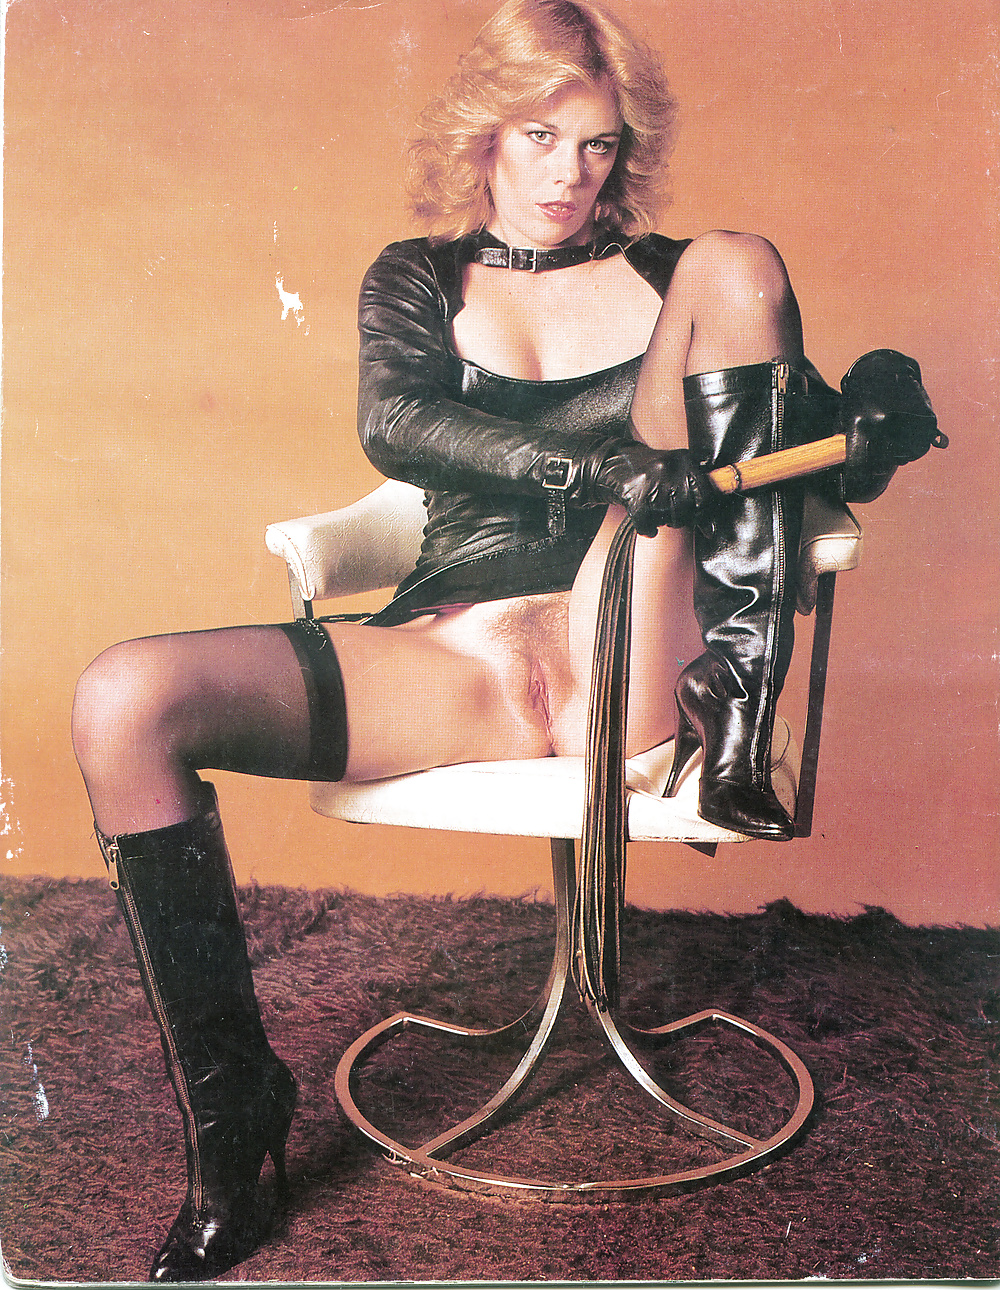 Vintage femdom magazines